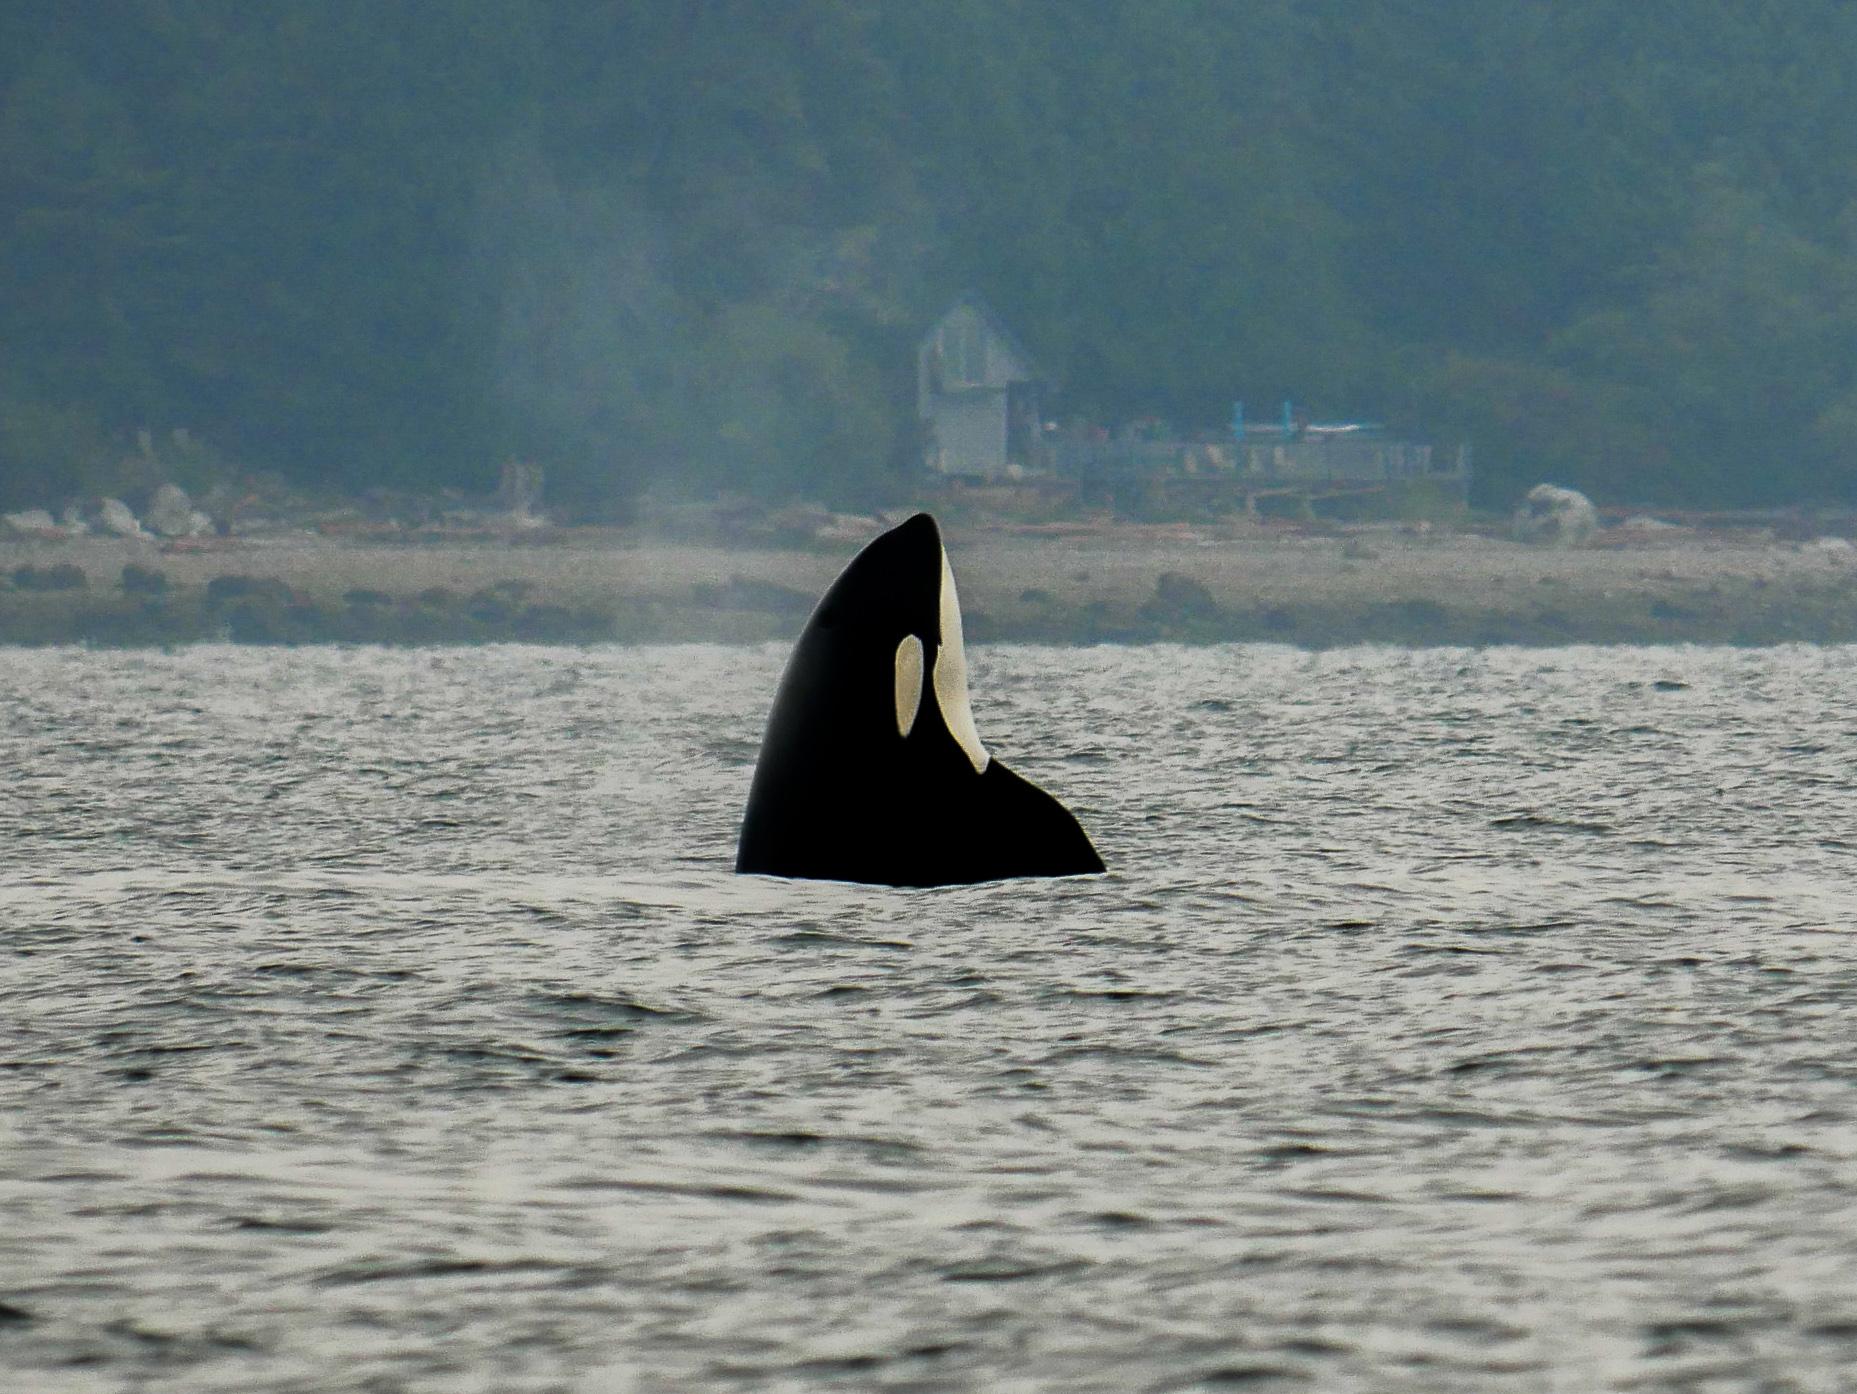 Orca spy hops off the shoreline. Photo by Alanna Vivani - 10:30 tour.